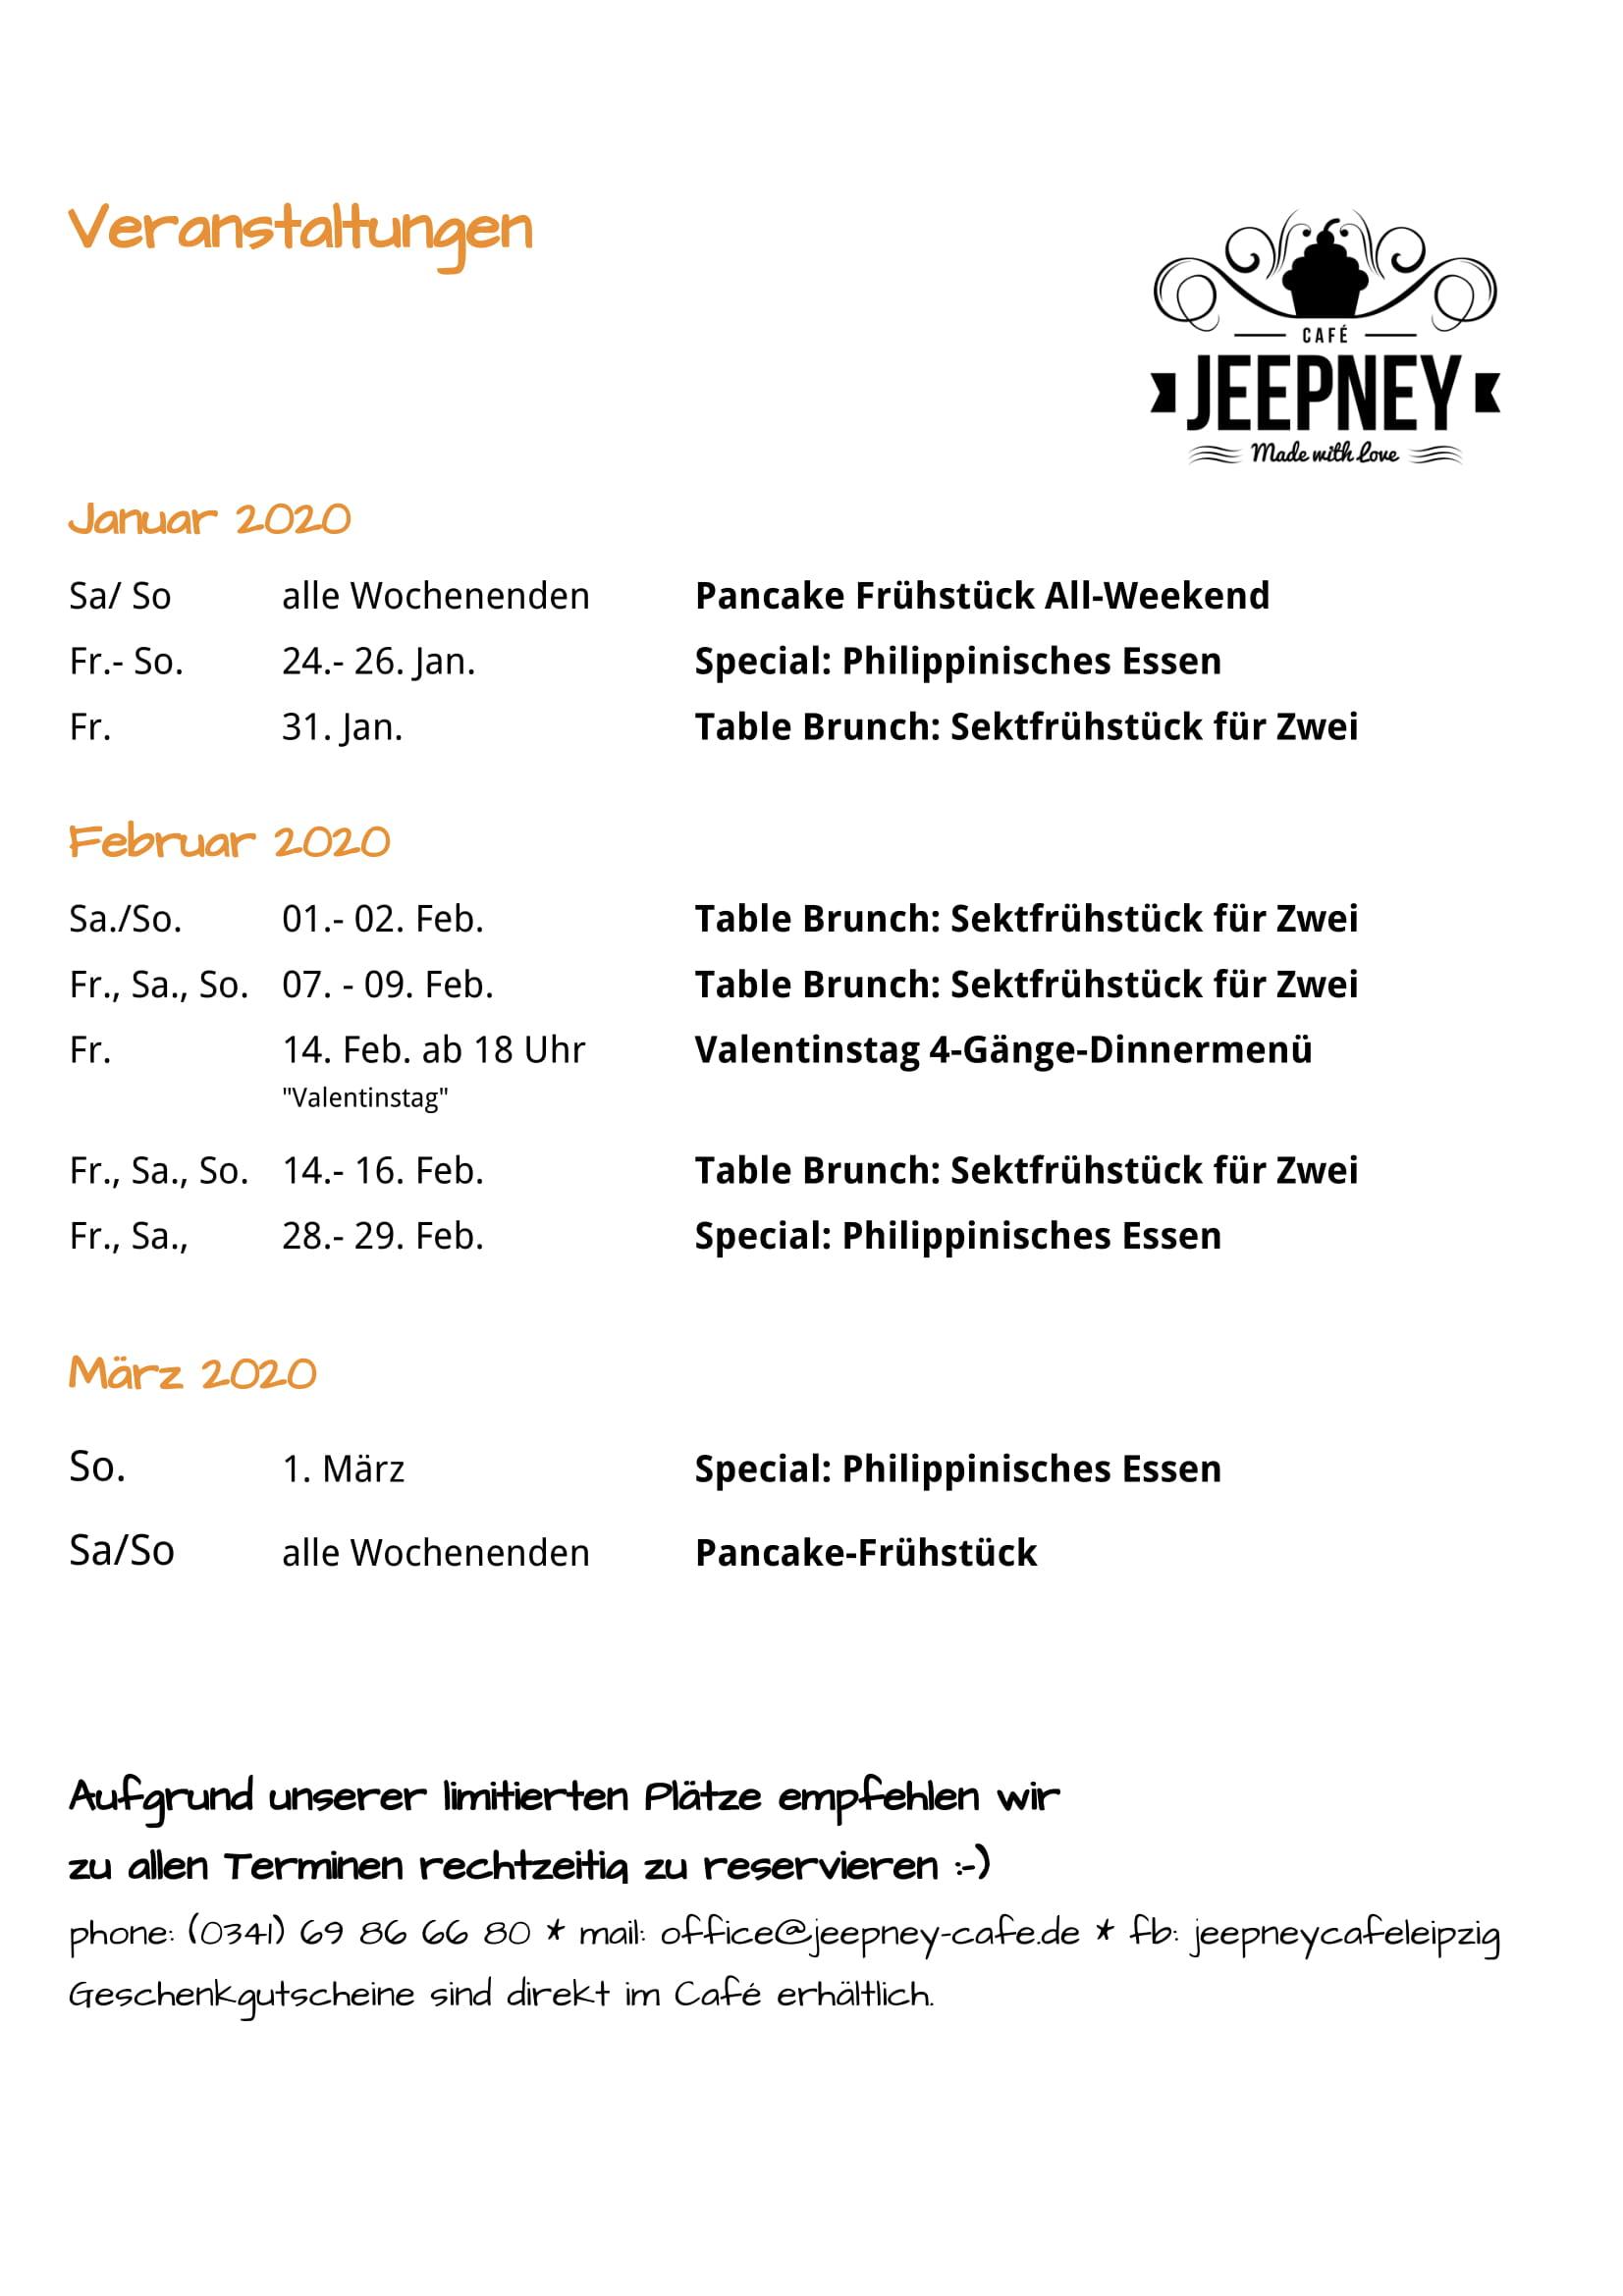 Veranstaltungen Januar 2020